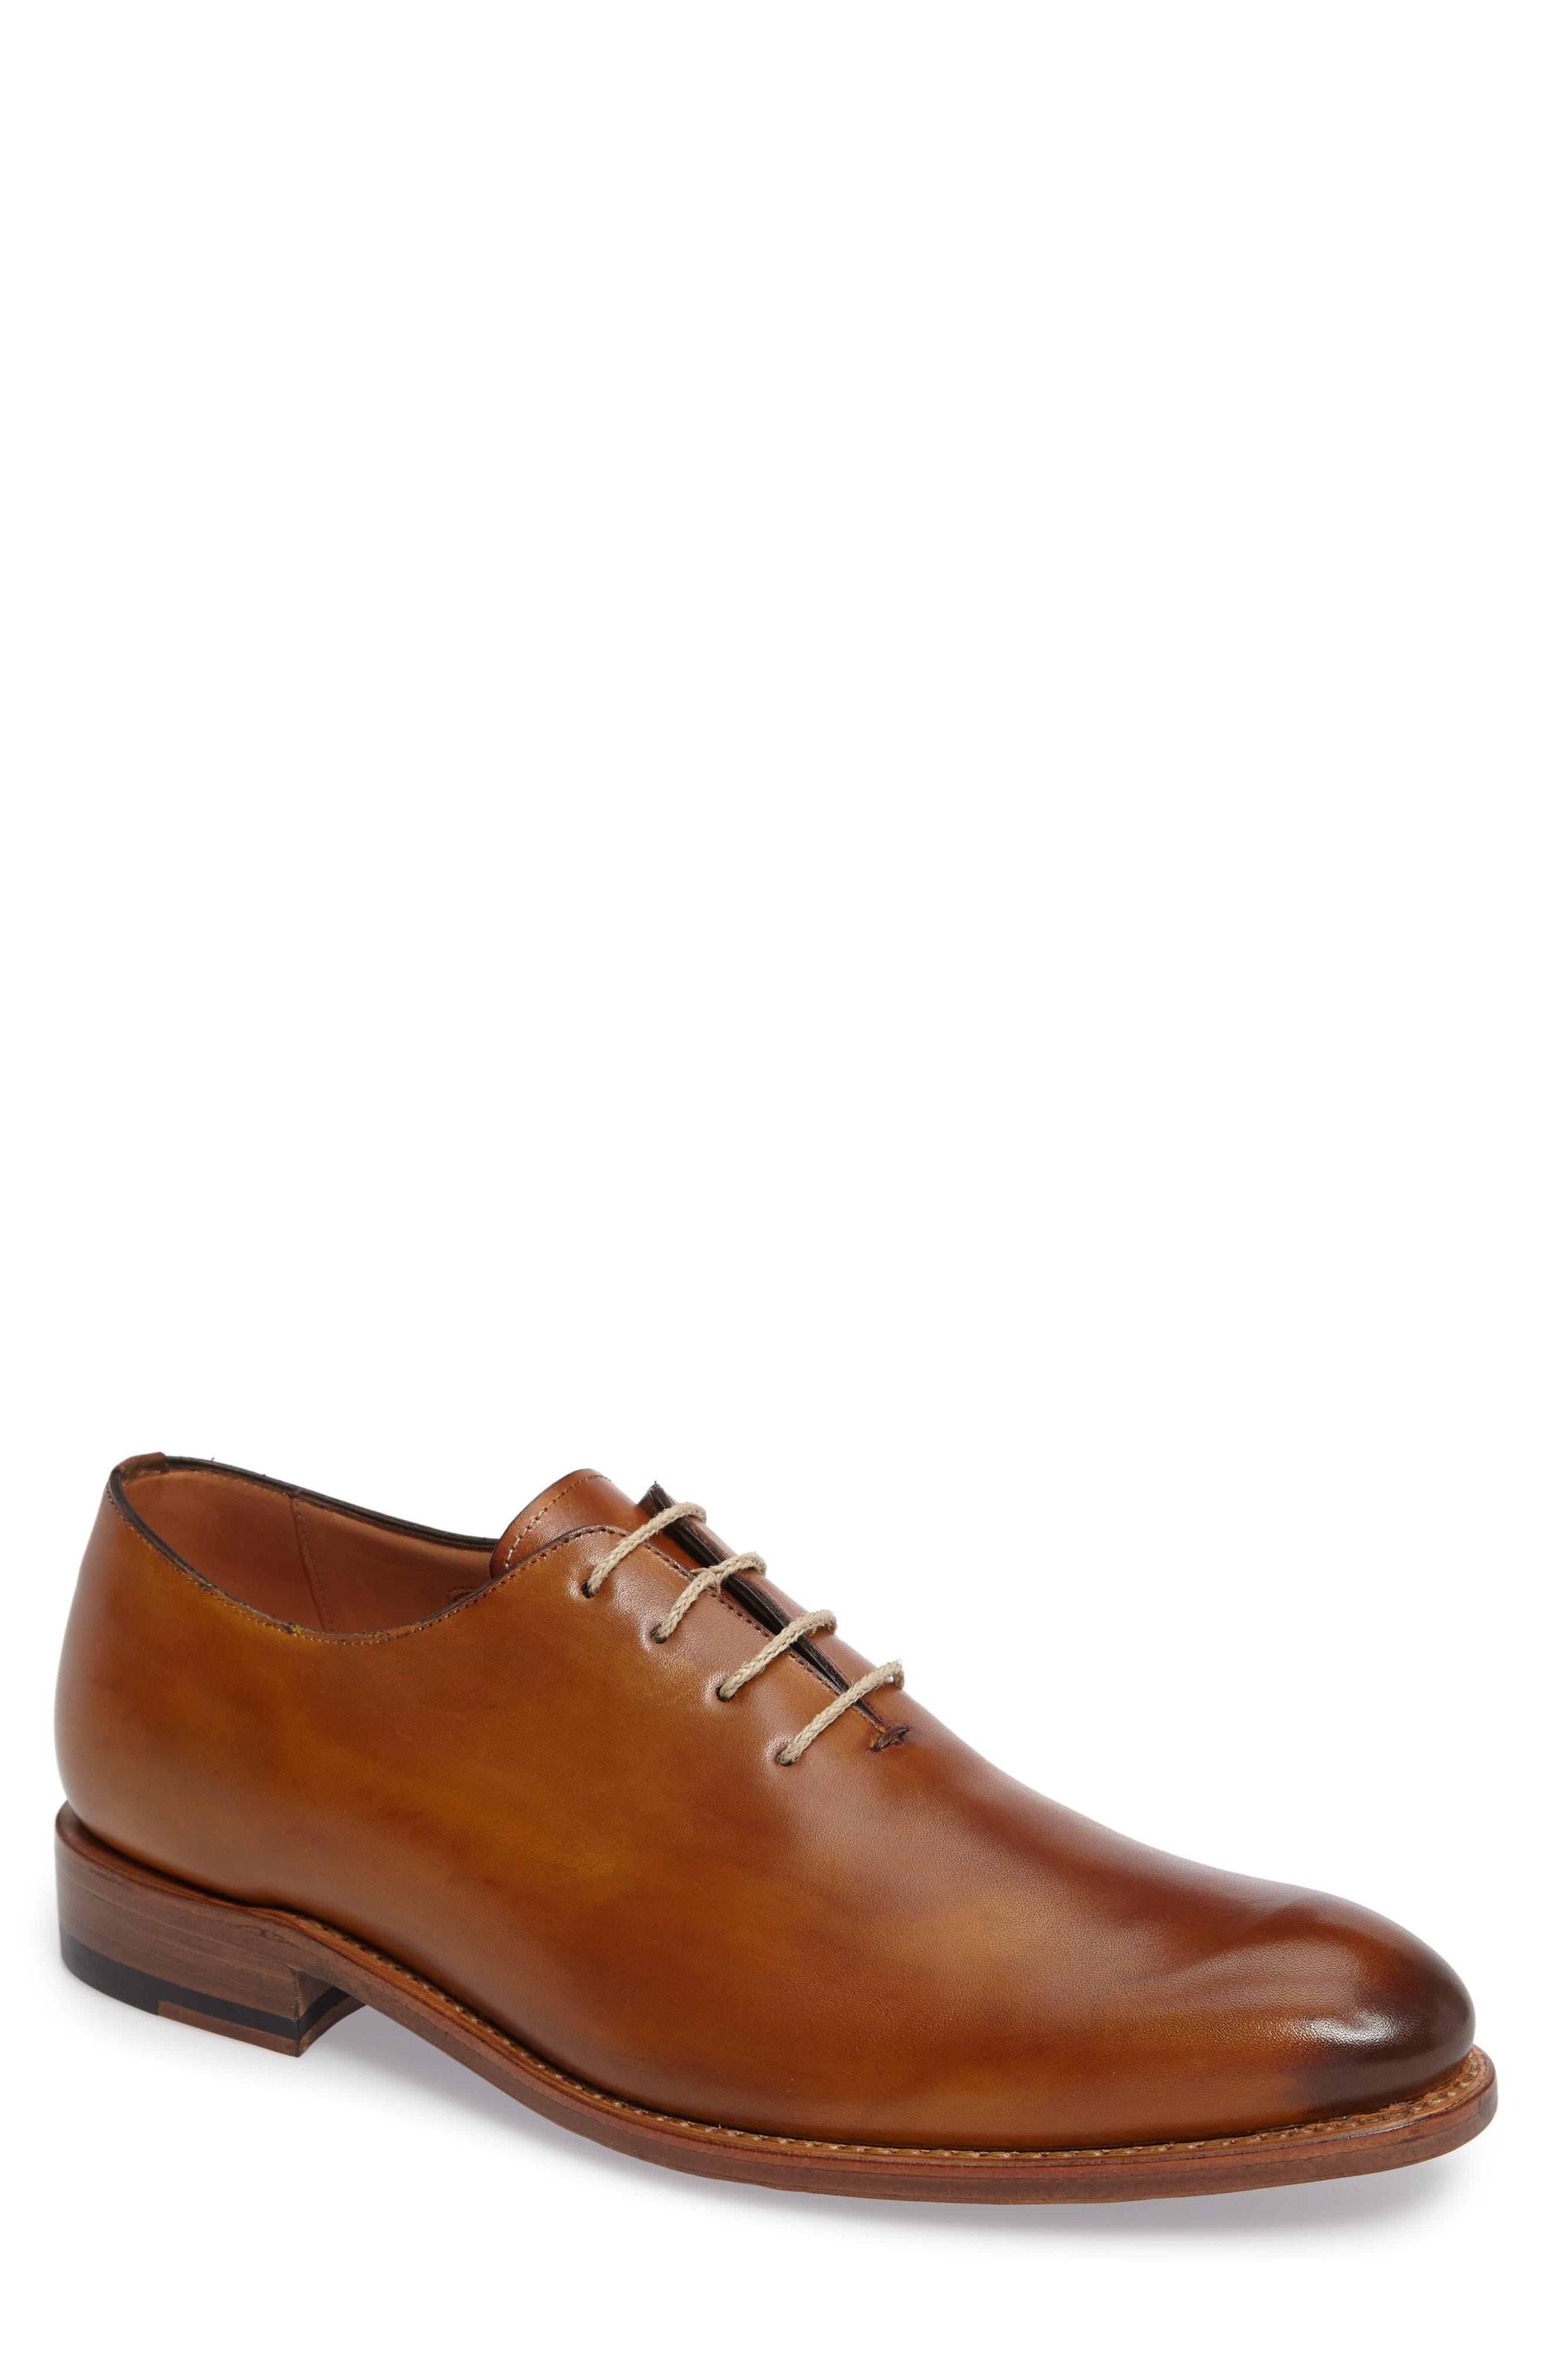 Impronta by Mezlan G105 Plain Toe Derby (Men)